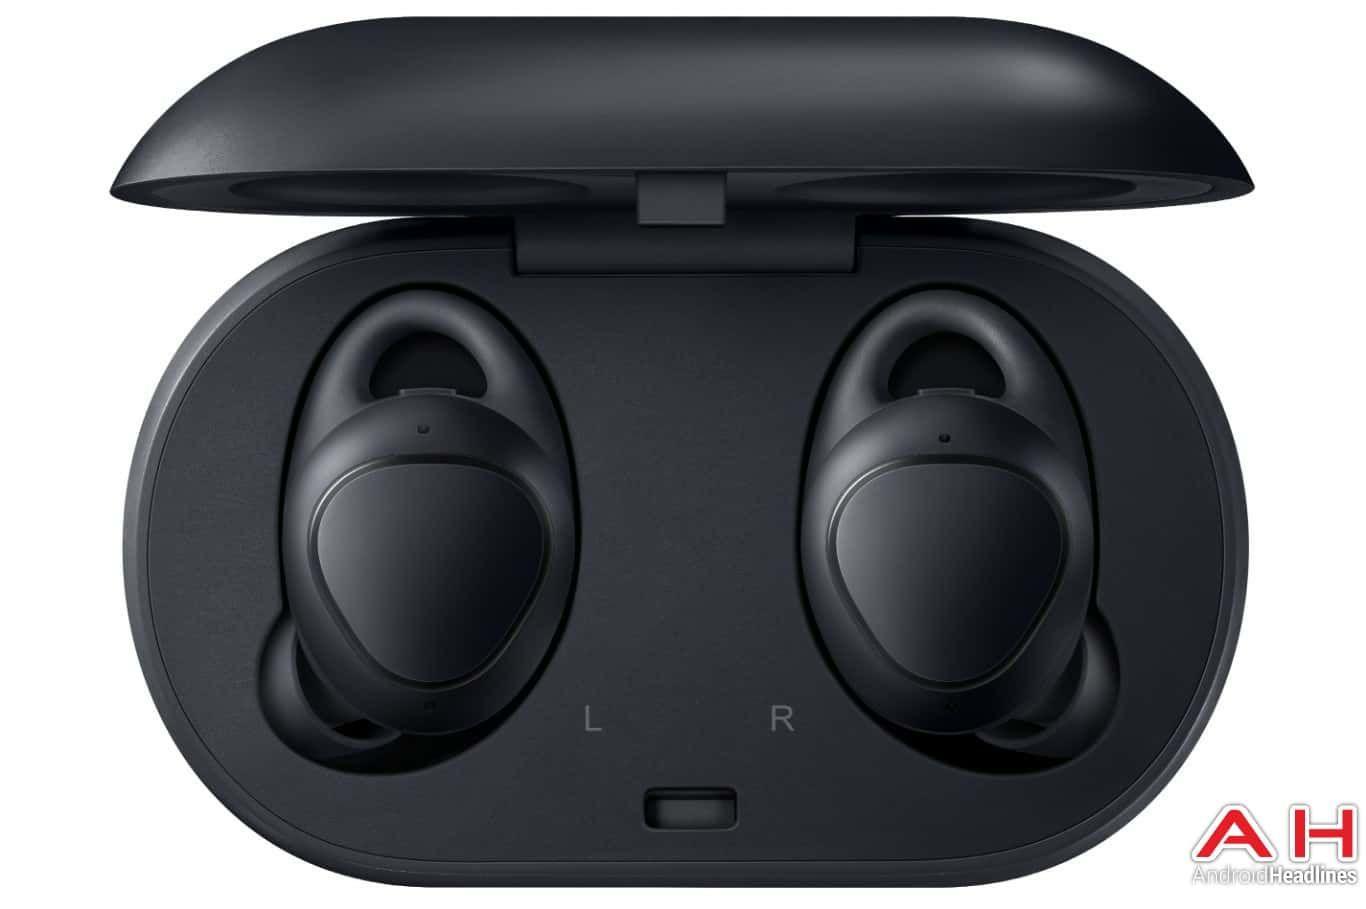 Samsung Gear Iconx 2018 Earphones Price In Pakistan Earbuds Wireless Earbuds Workout Earbuds